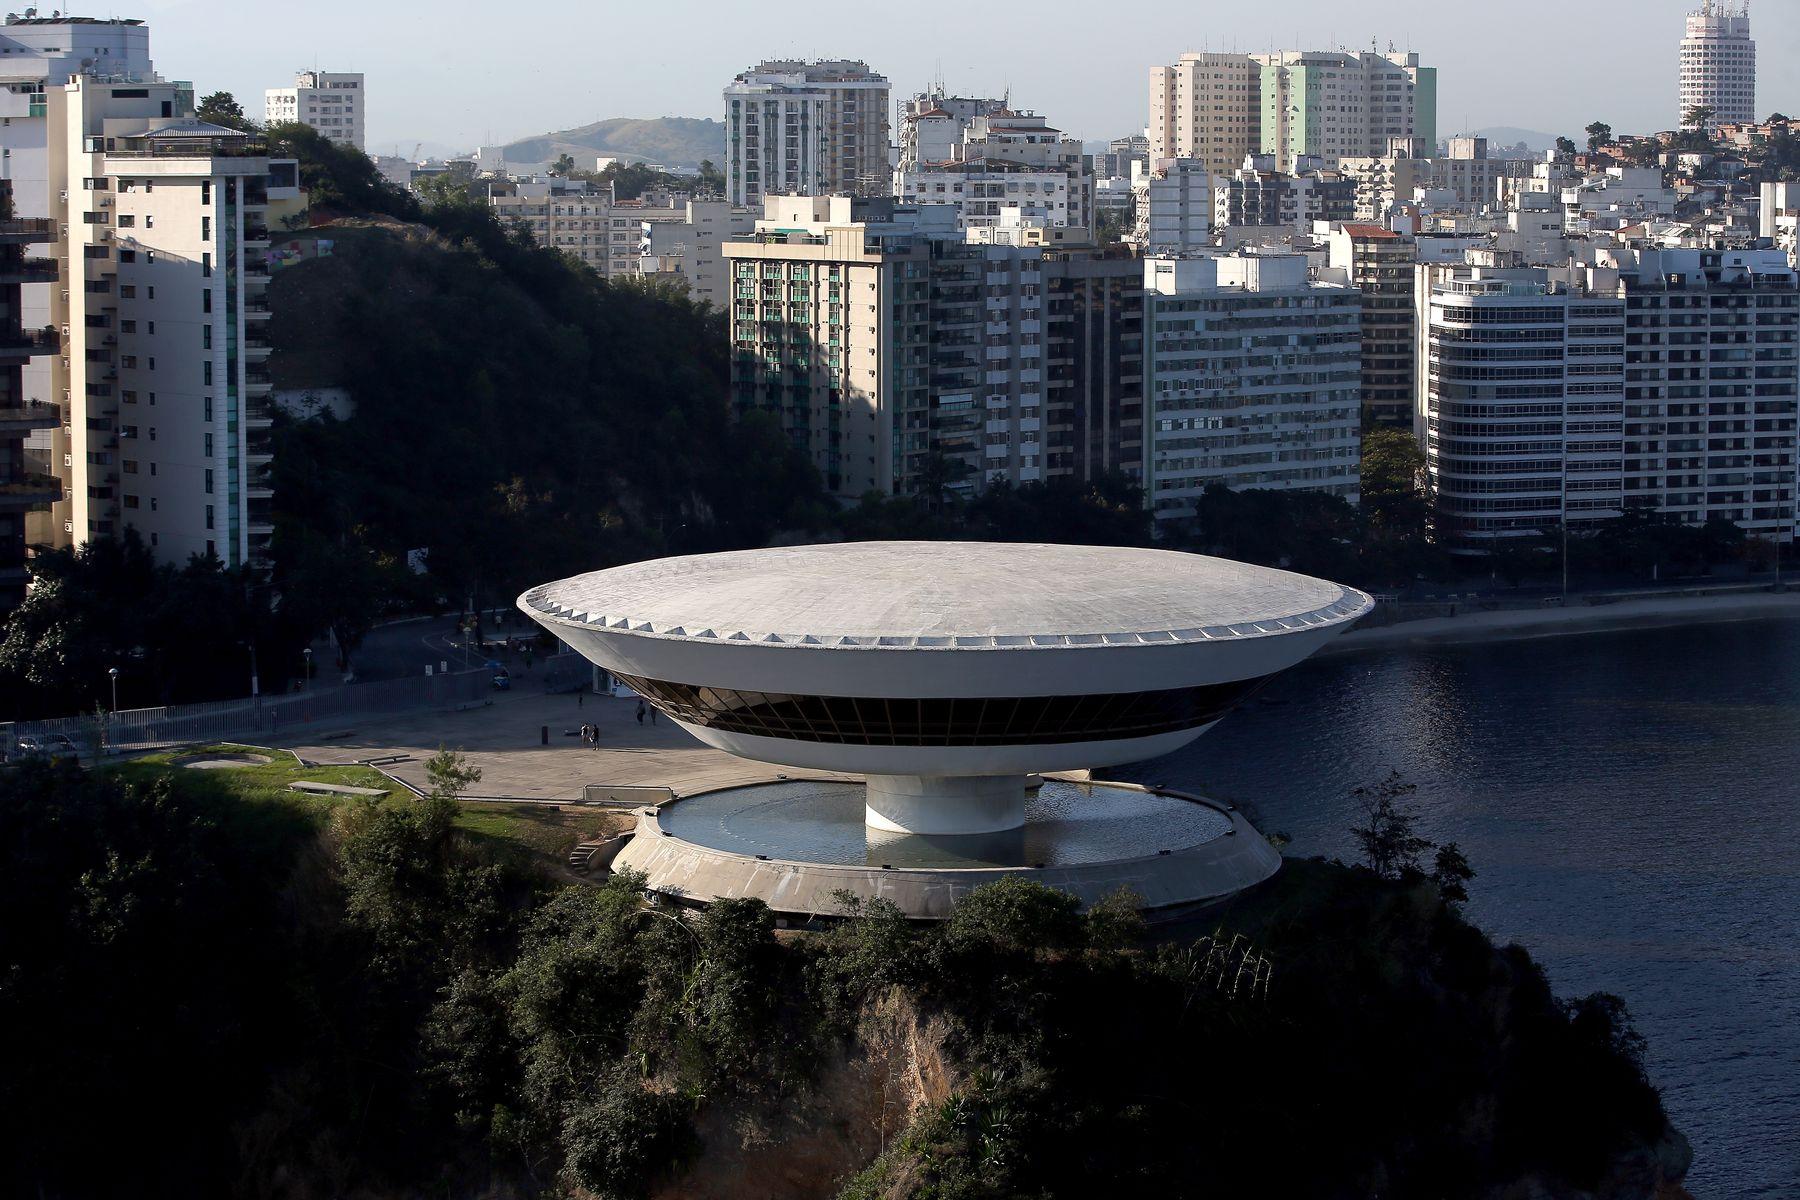 Museo de Arte Contemporáneo de Niterói (Río de Janeiro, Brasil)